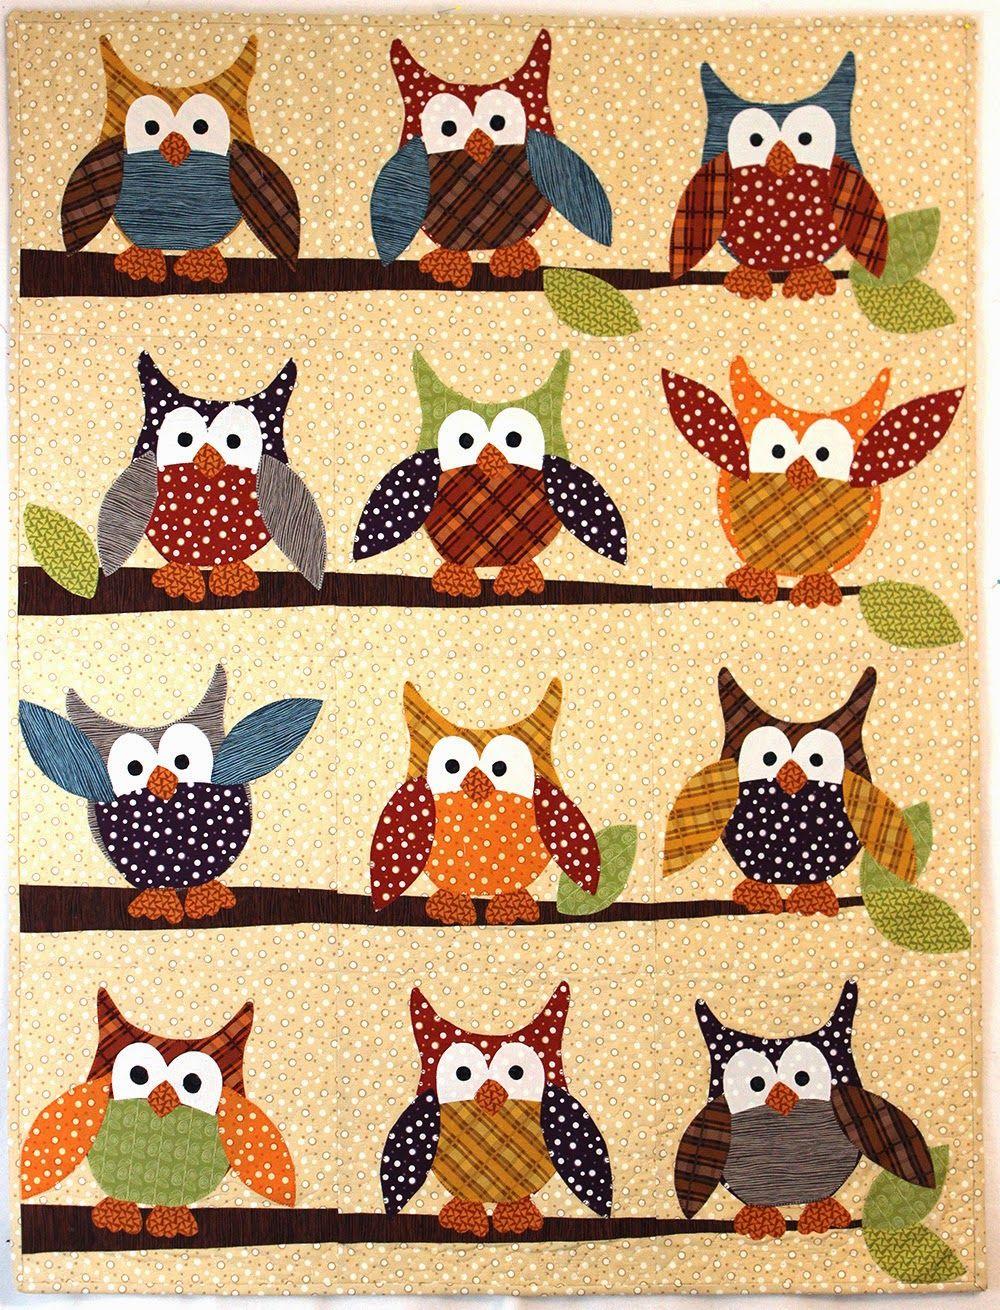 Owl Quilt Pattern : quilt, pattern, Jennifer, Jangles, Quilts,, Sewing, Patterns,, Quilt